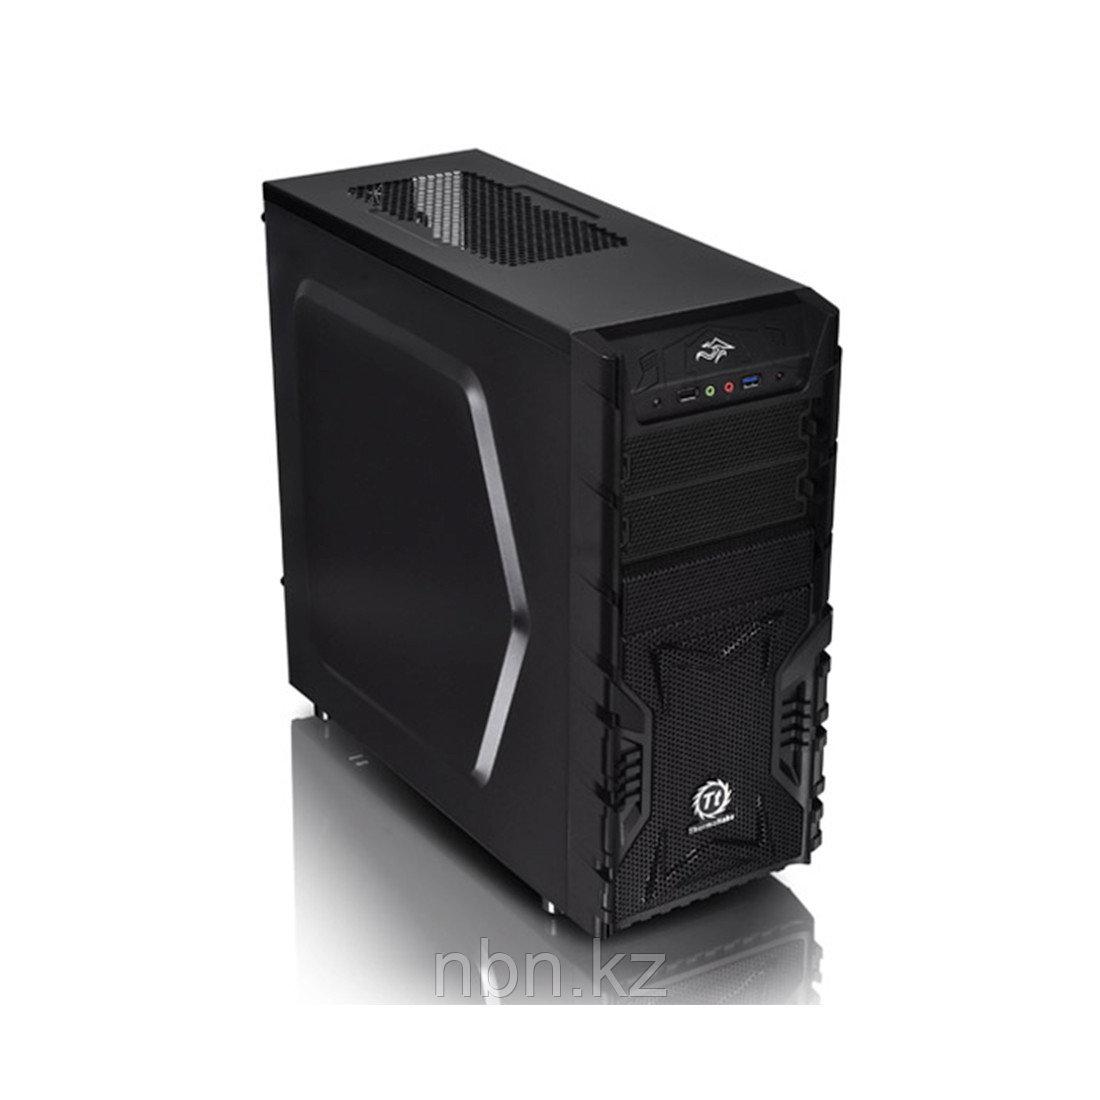 Компьютерный корпус Thermaltake Versa H23 без Б/П